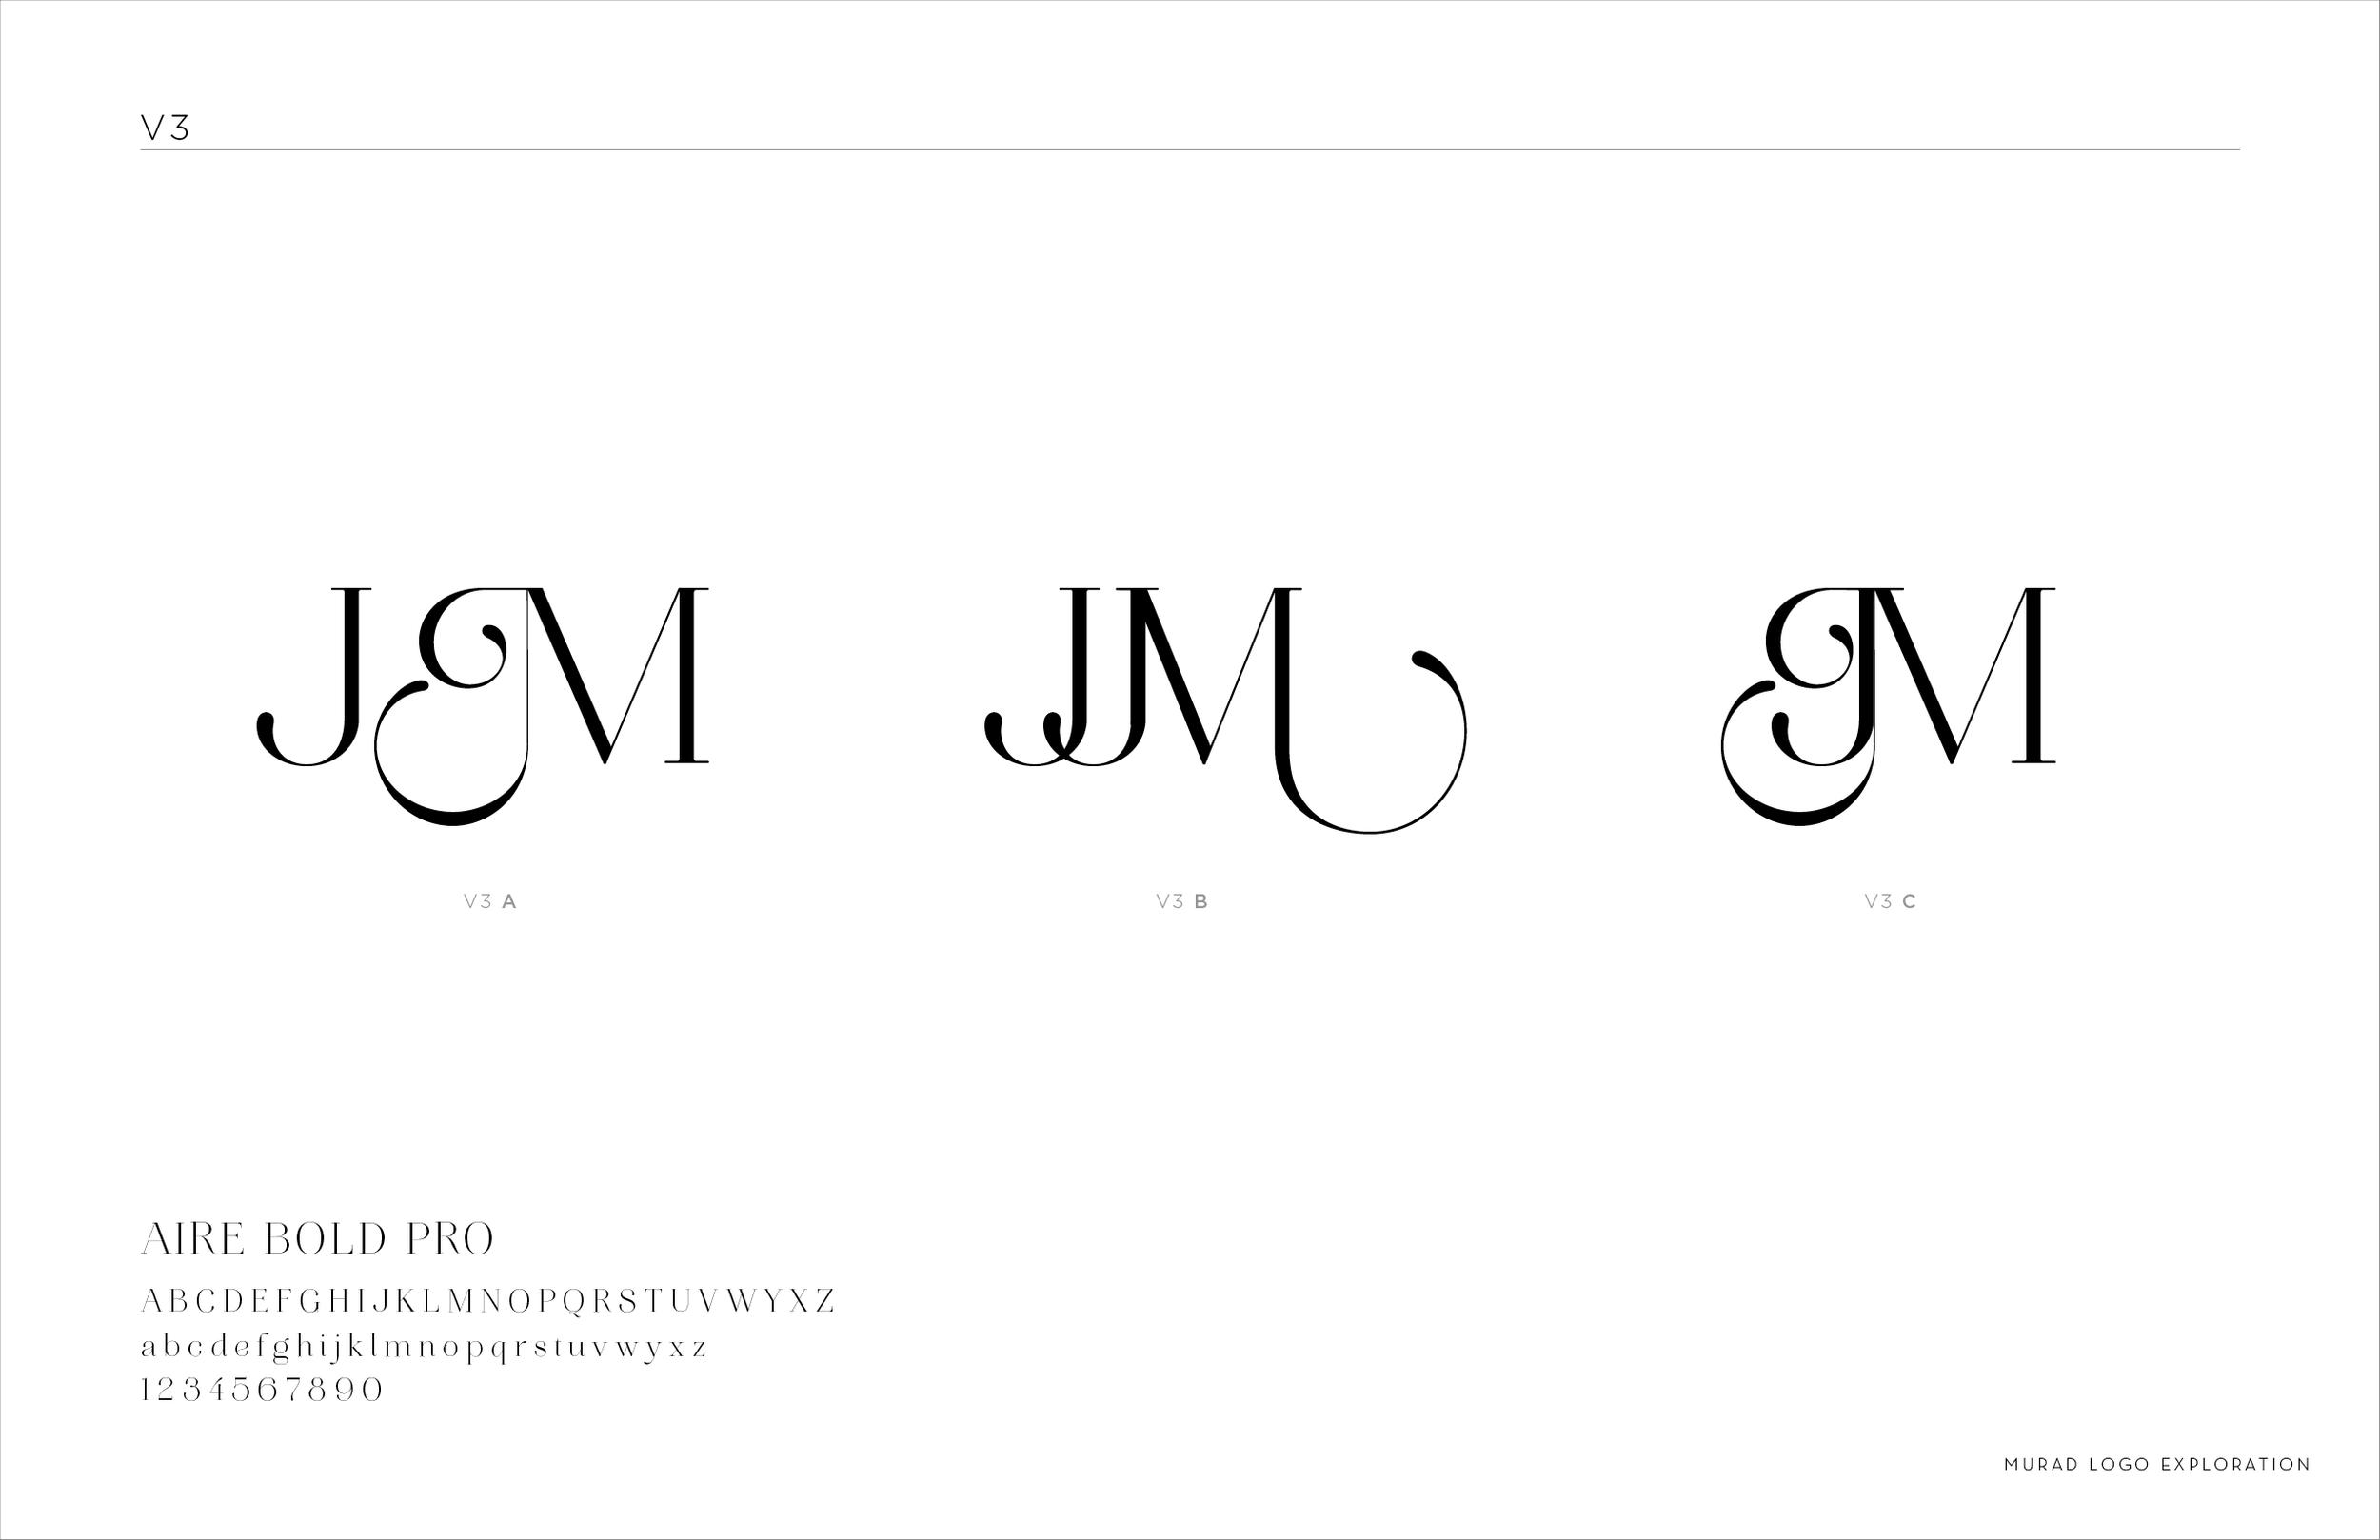 Miss-Vu_Murad_Wine_Logo_Exploration_6.png